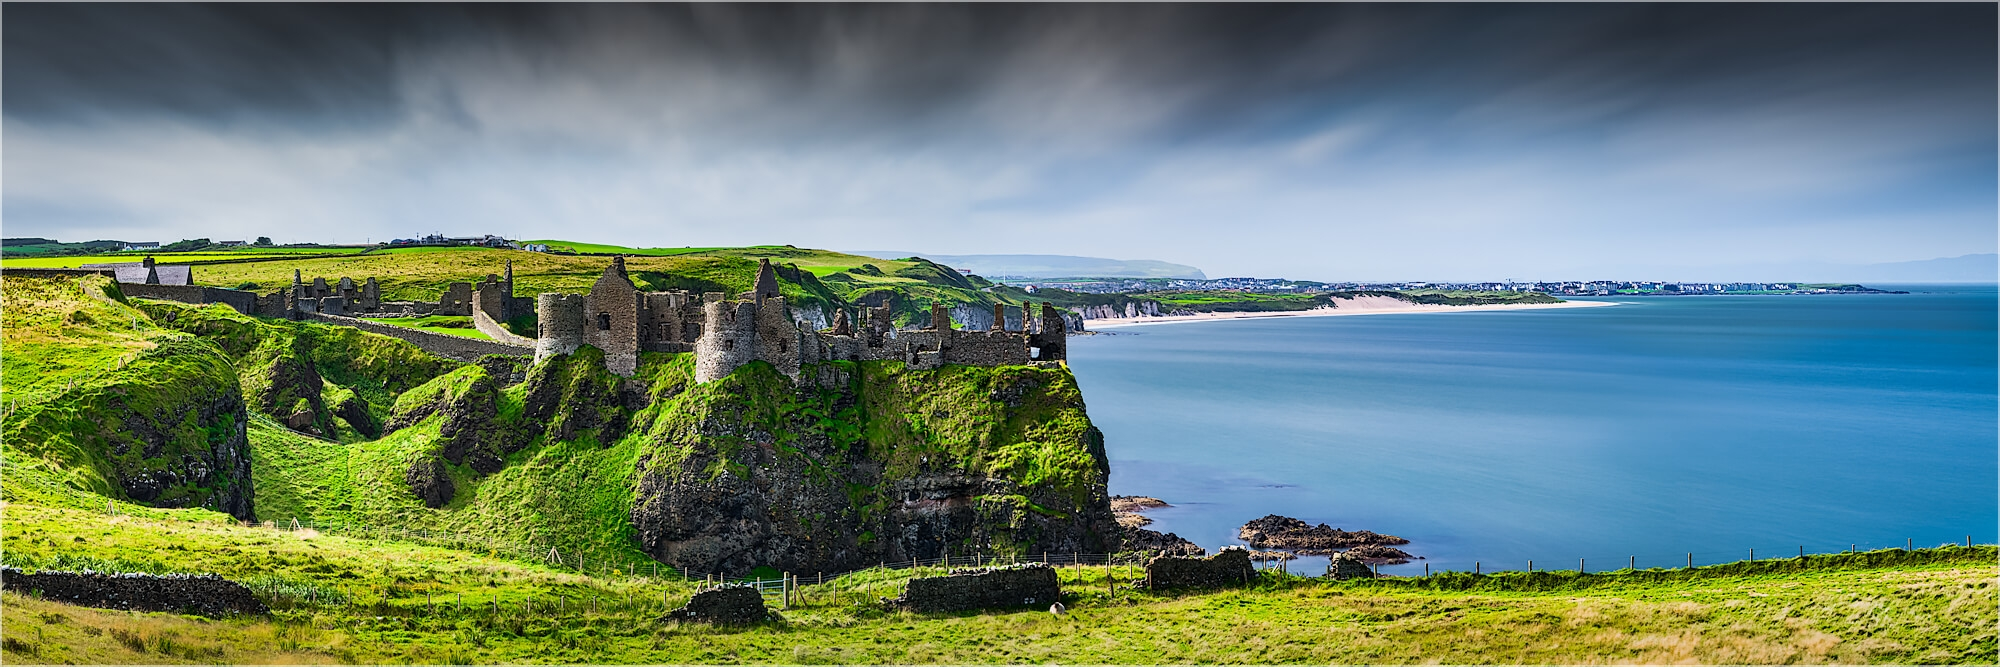 Panoramabild Dunluce Castle Portrush Irland